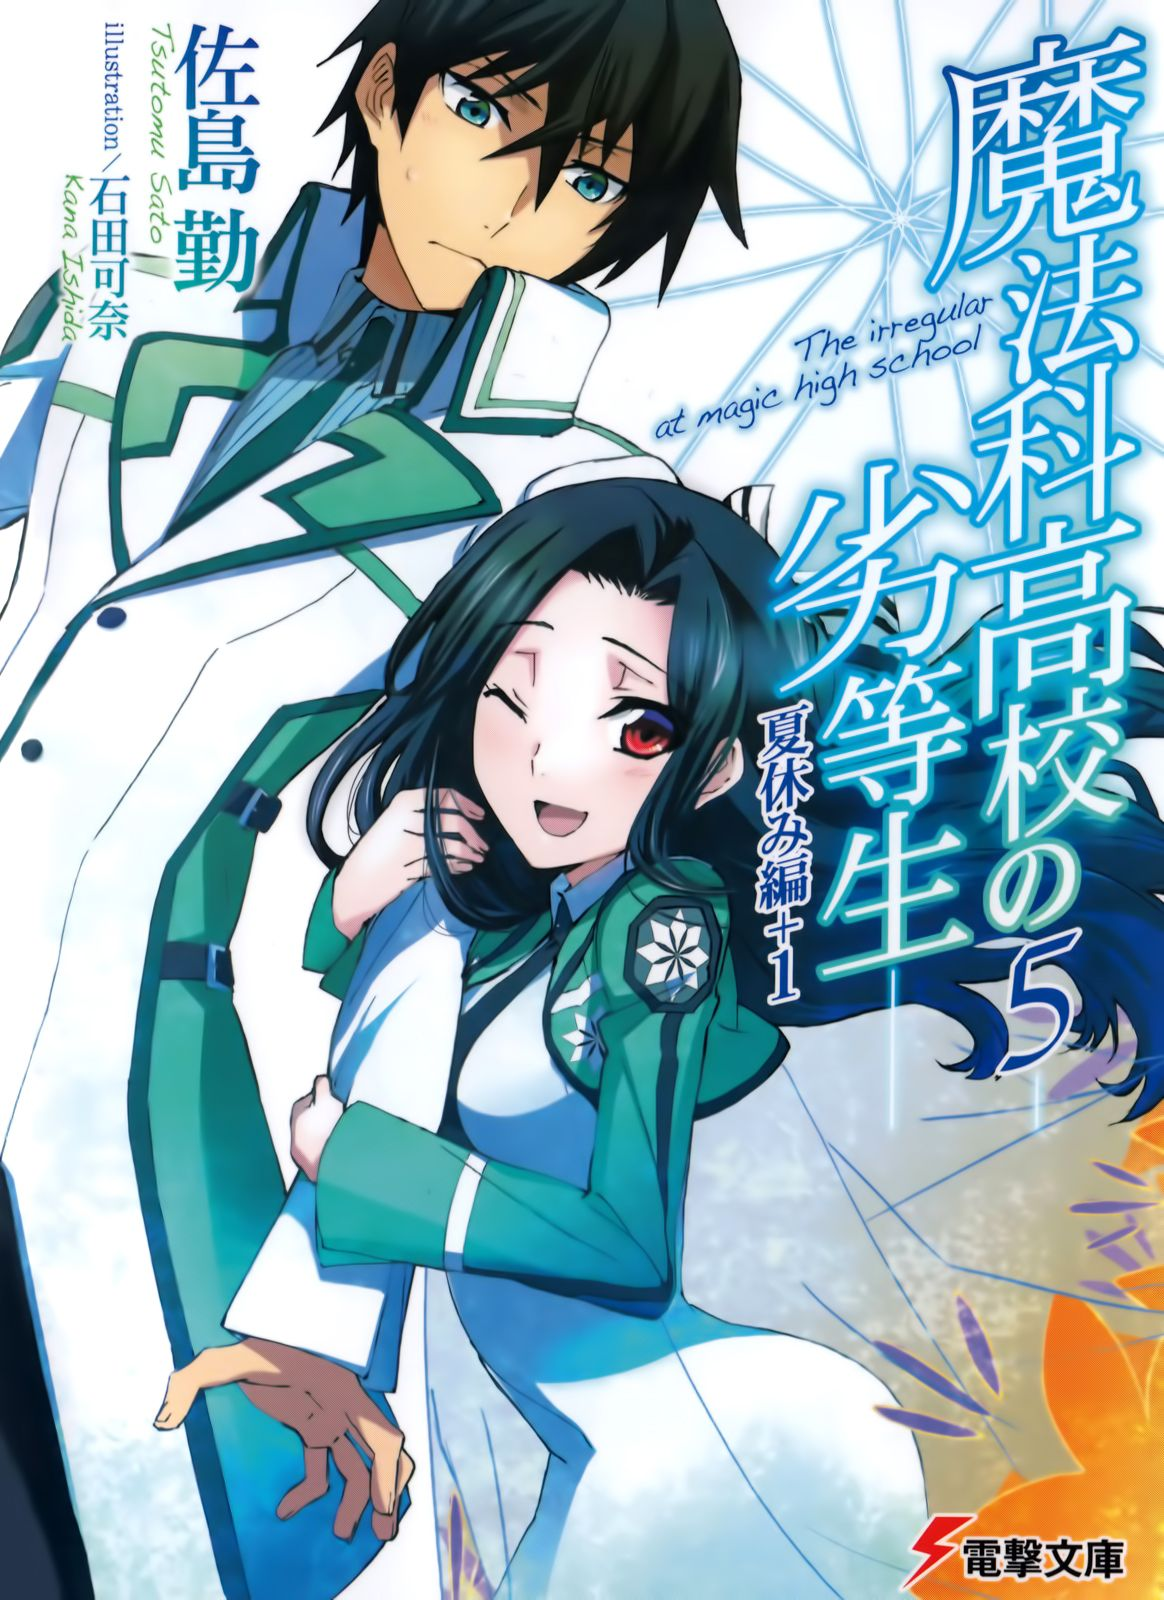 Mahouka [LN/M] Character Speculation/Theories Mayumi